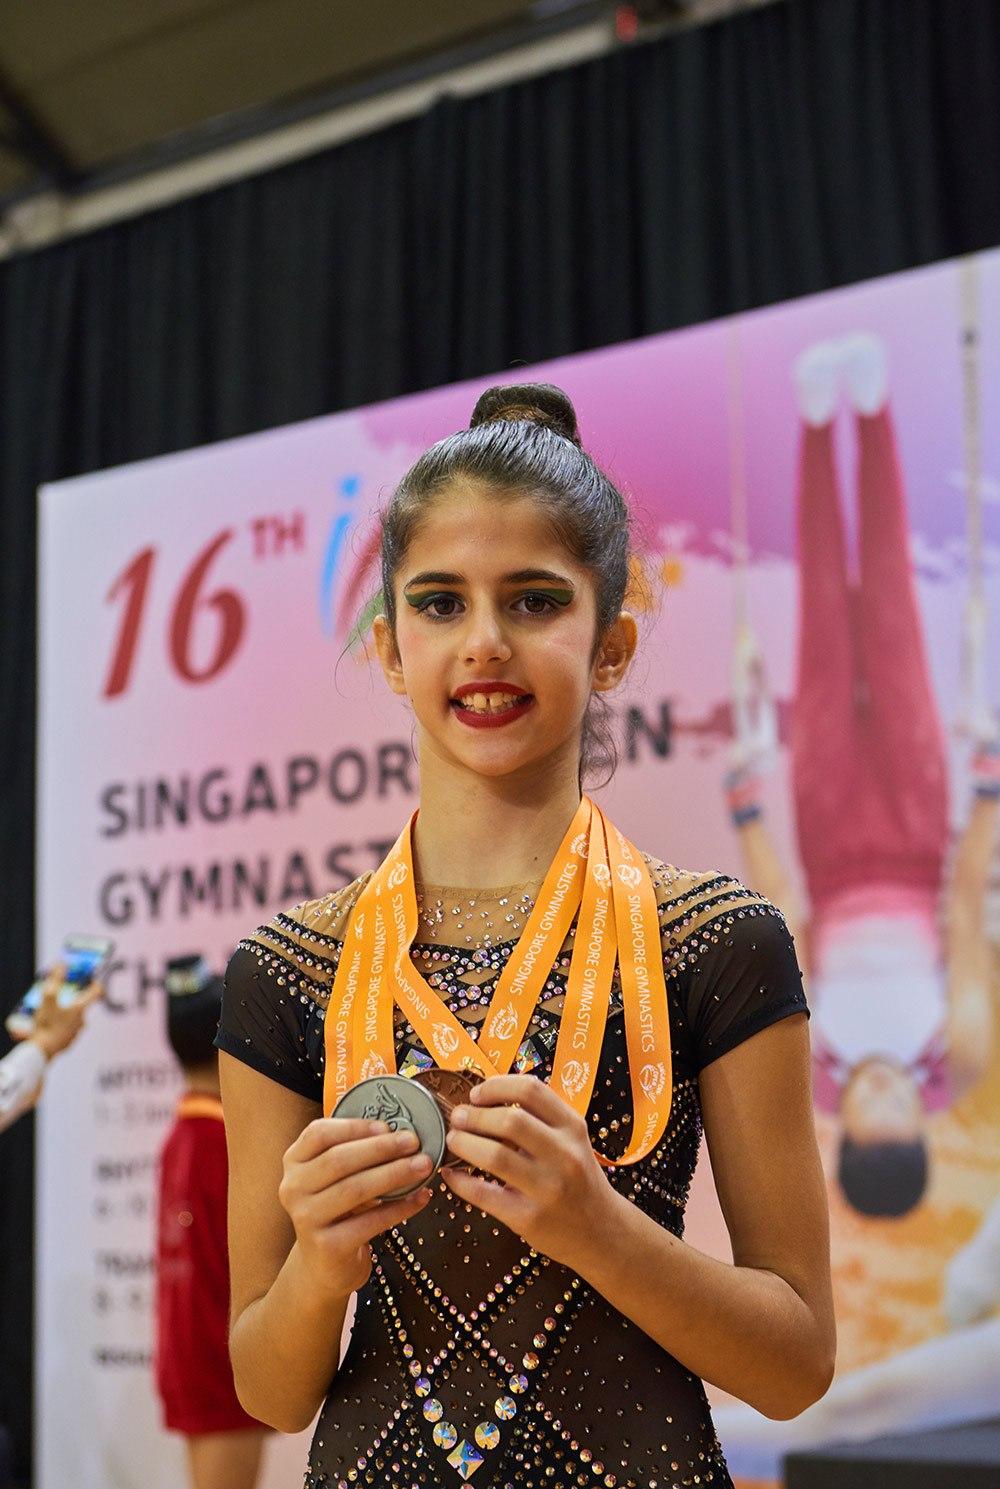 Singapore Gymnastics Open Championships 2019 72